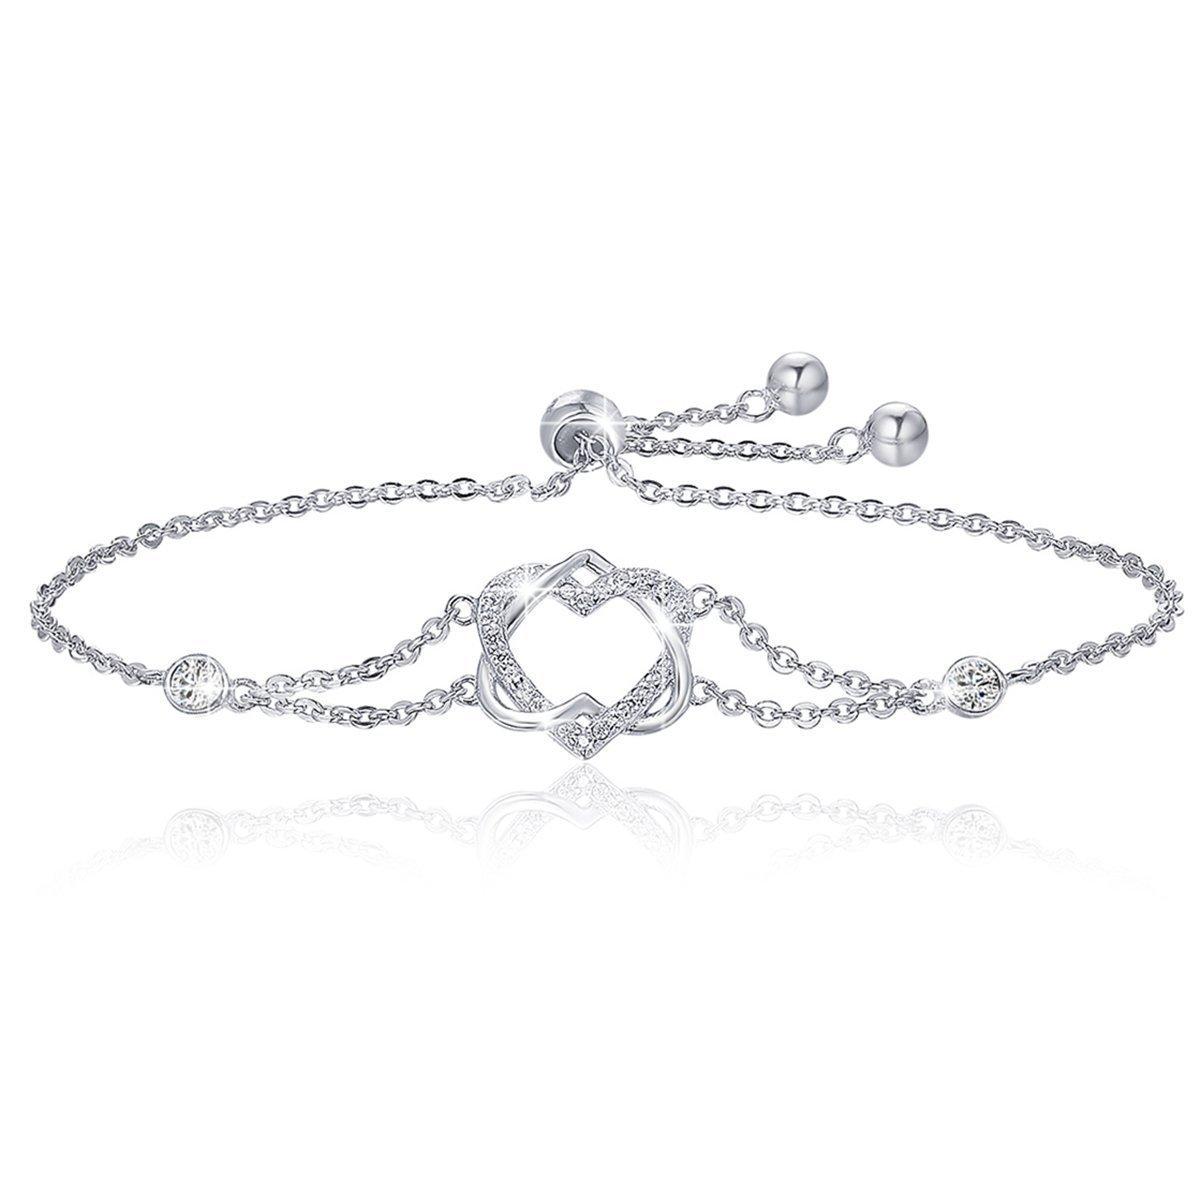 7e475e8c1 Amazon.com: BAMOER 925 Sterling Silver Double Heart Bracelet Adjustable  Chain Bracelets for Women Girls for Her: Jewelry